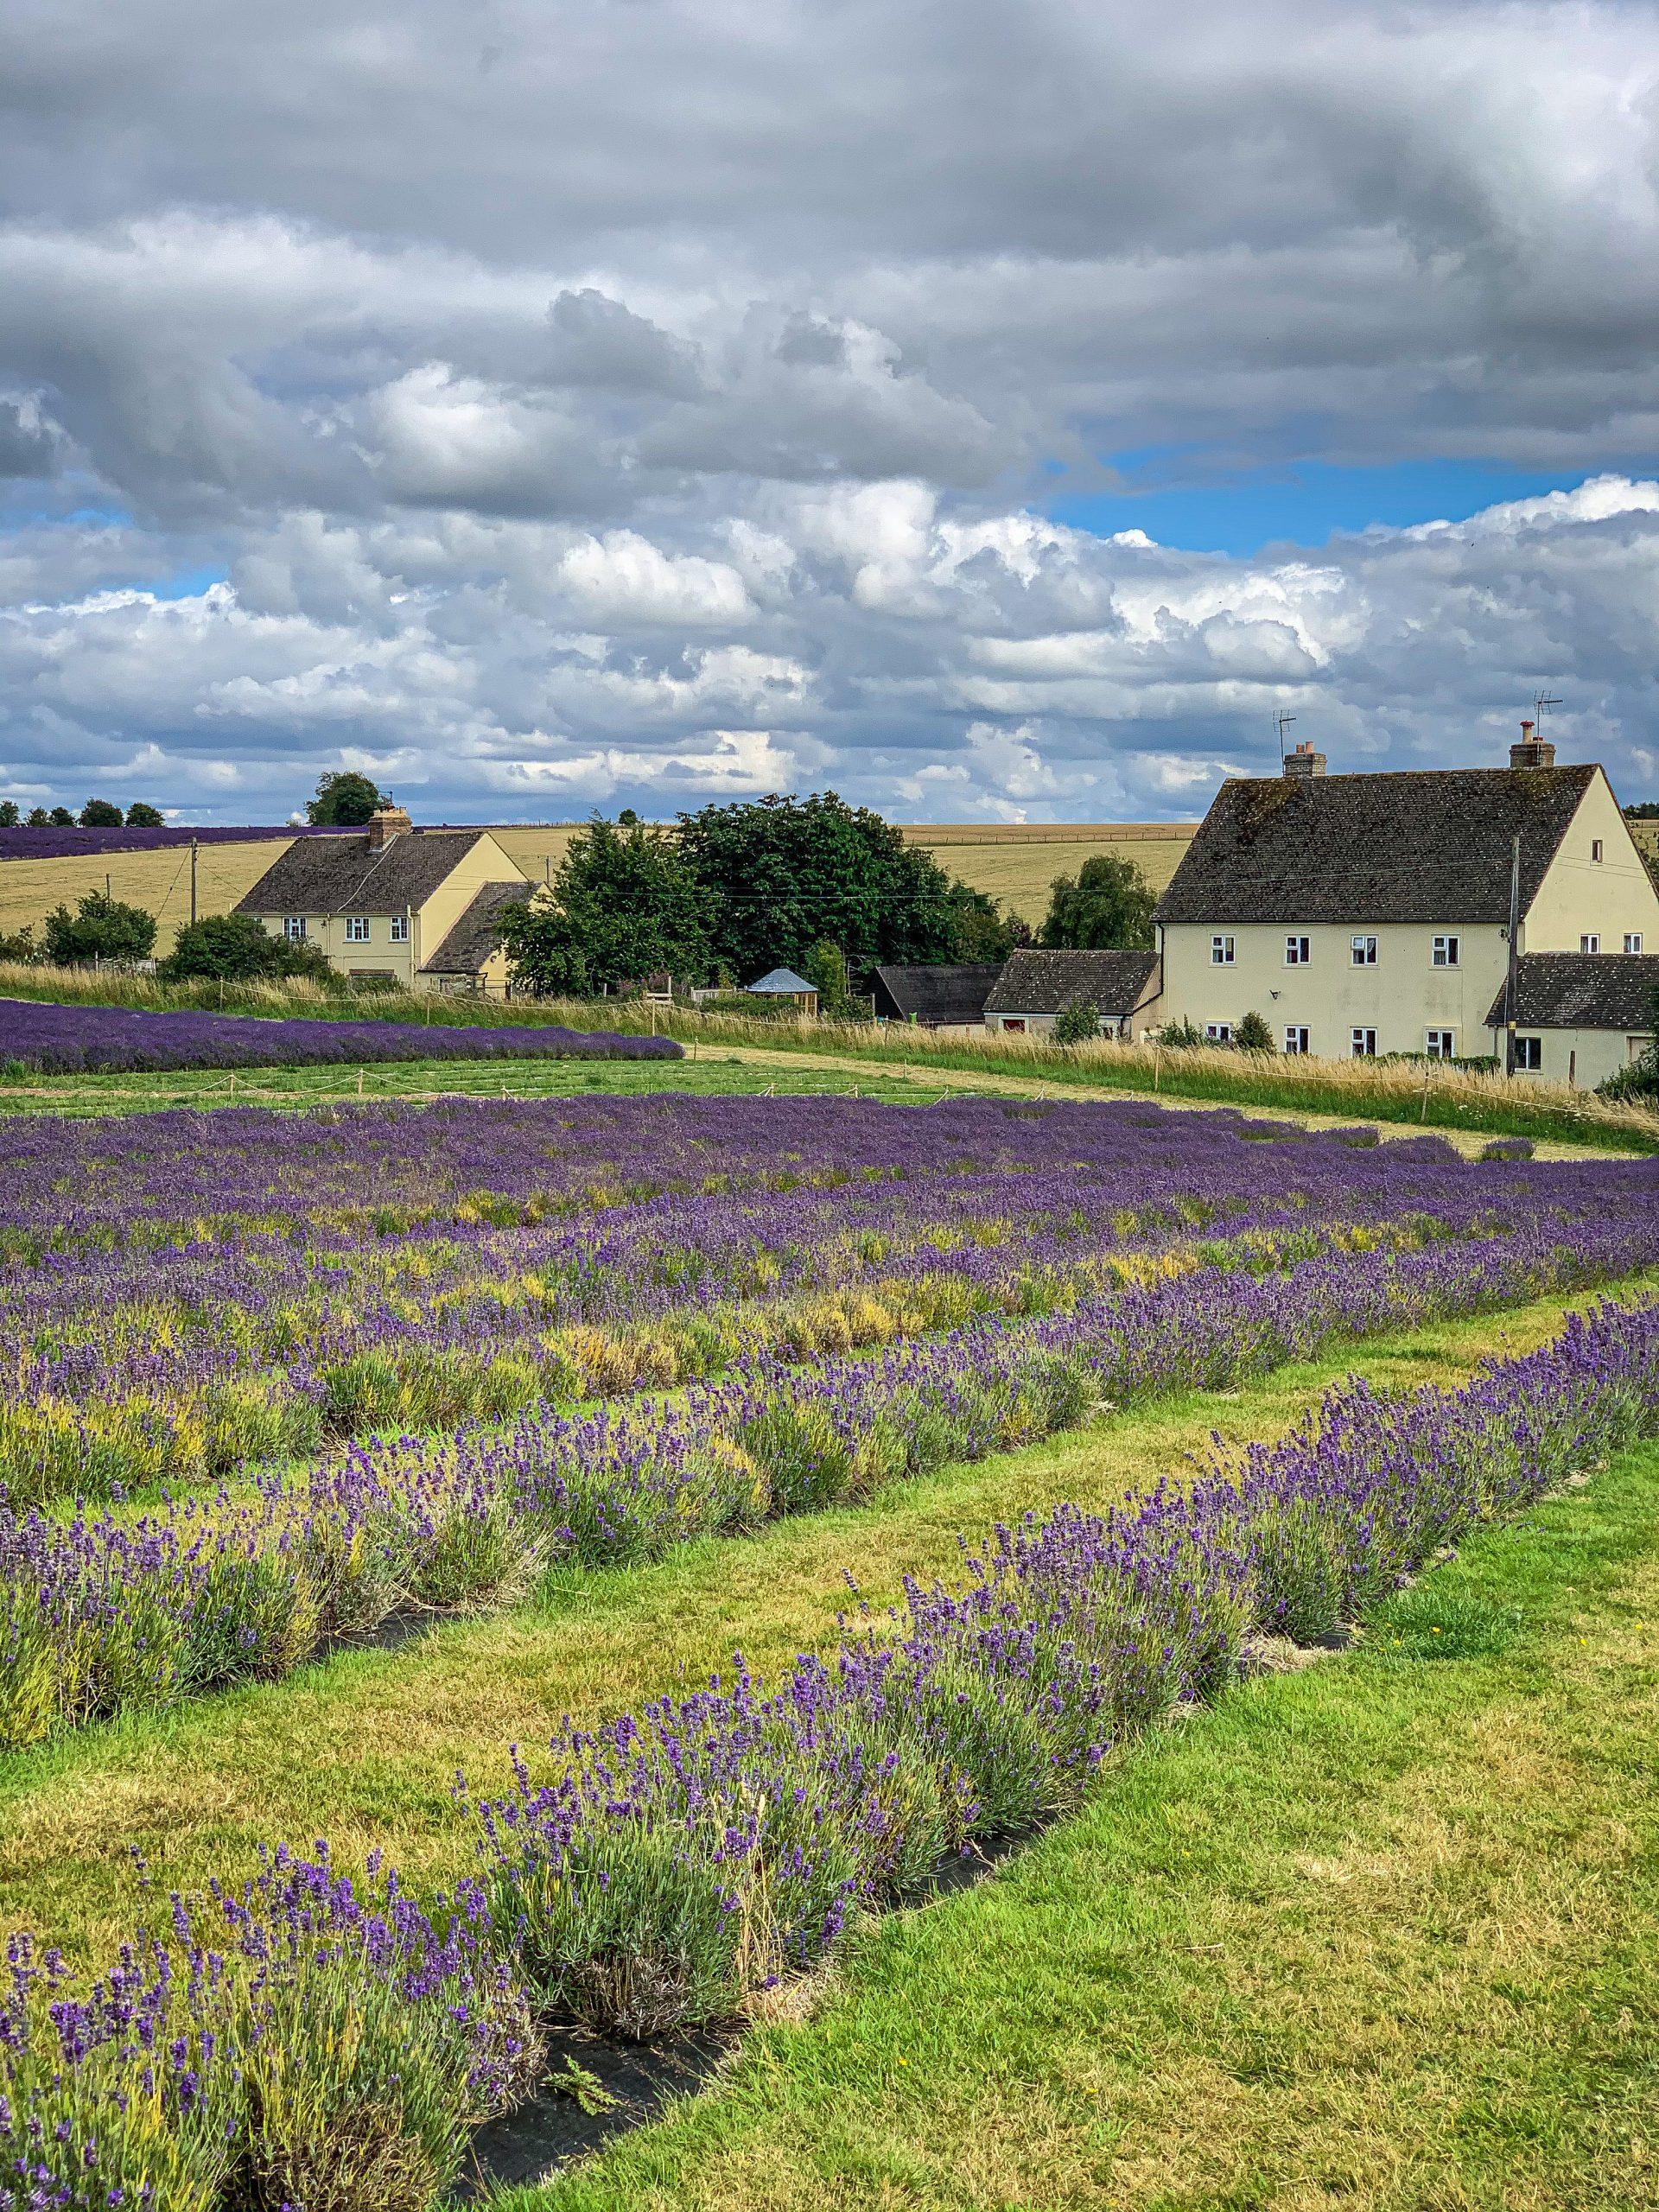 Cotwolss lavender farm pic: Kerstin rodgers/msmarmitelover.com